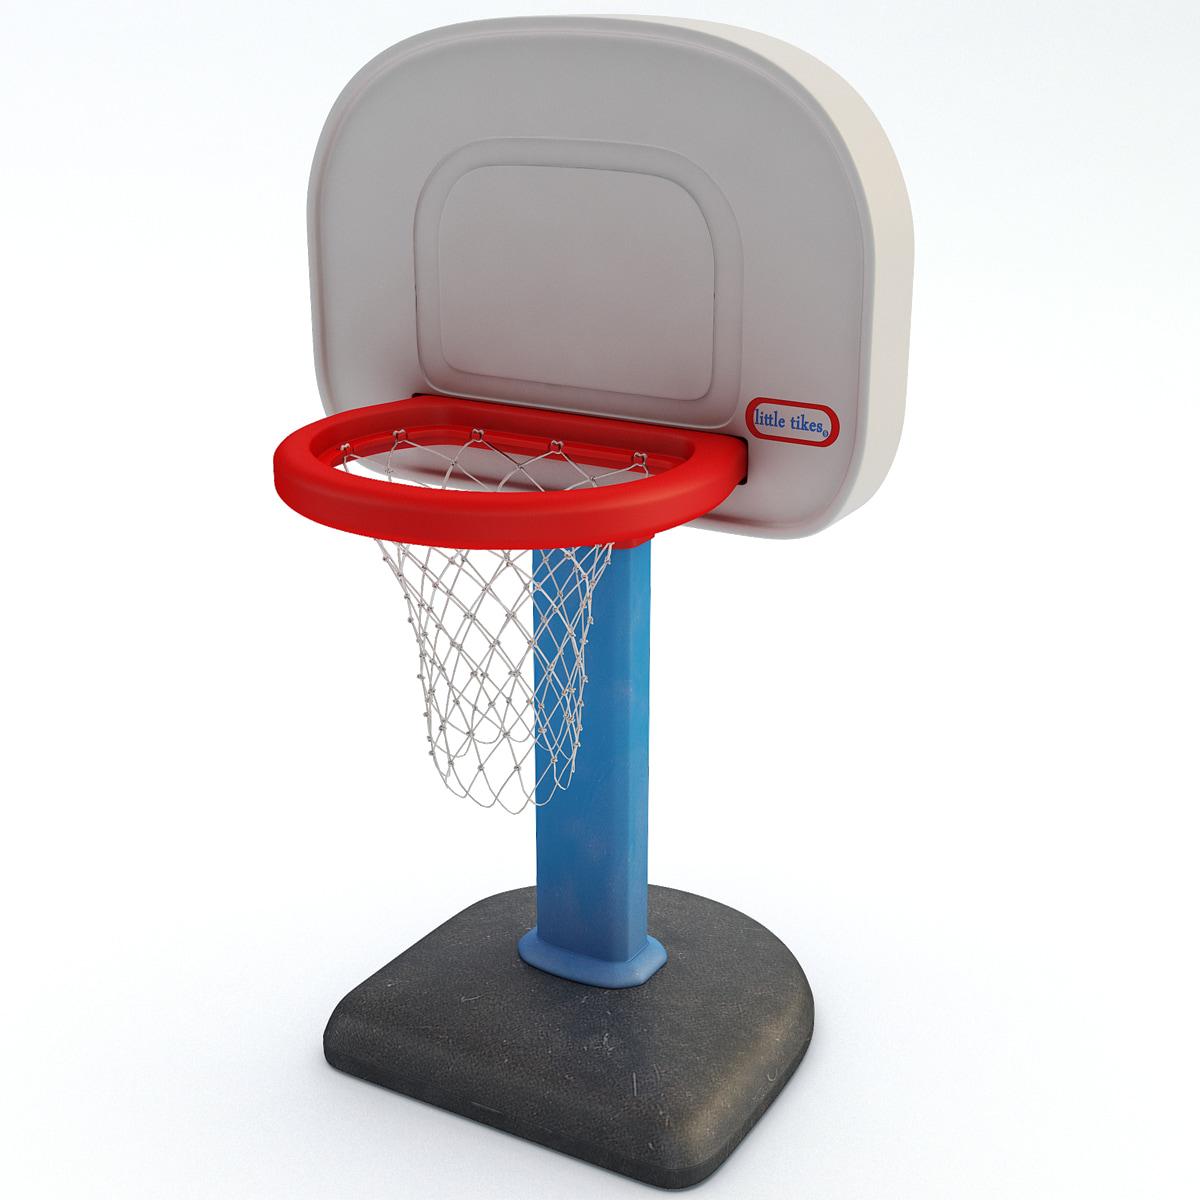 Adjustable: Fisher Price Adjustable Basketball Hoop